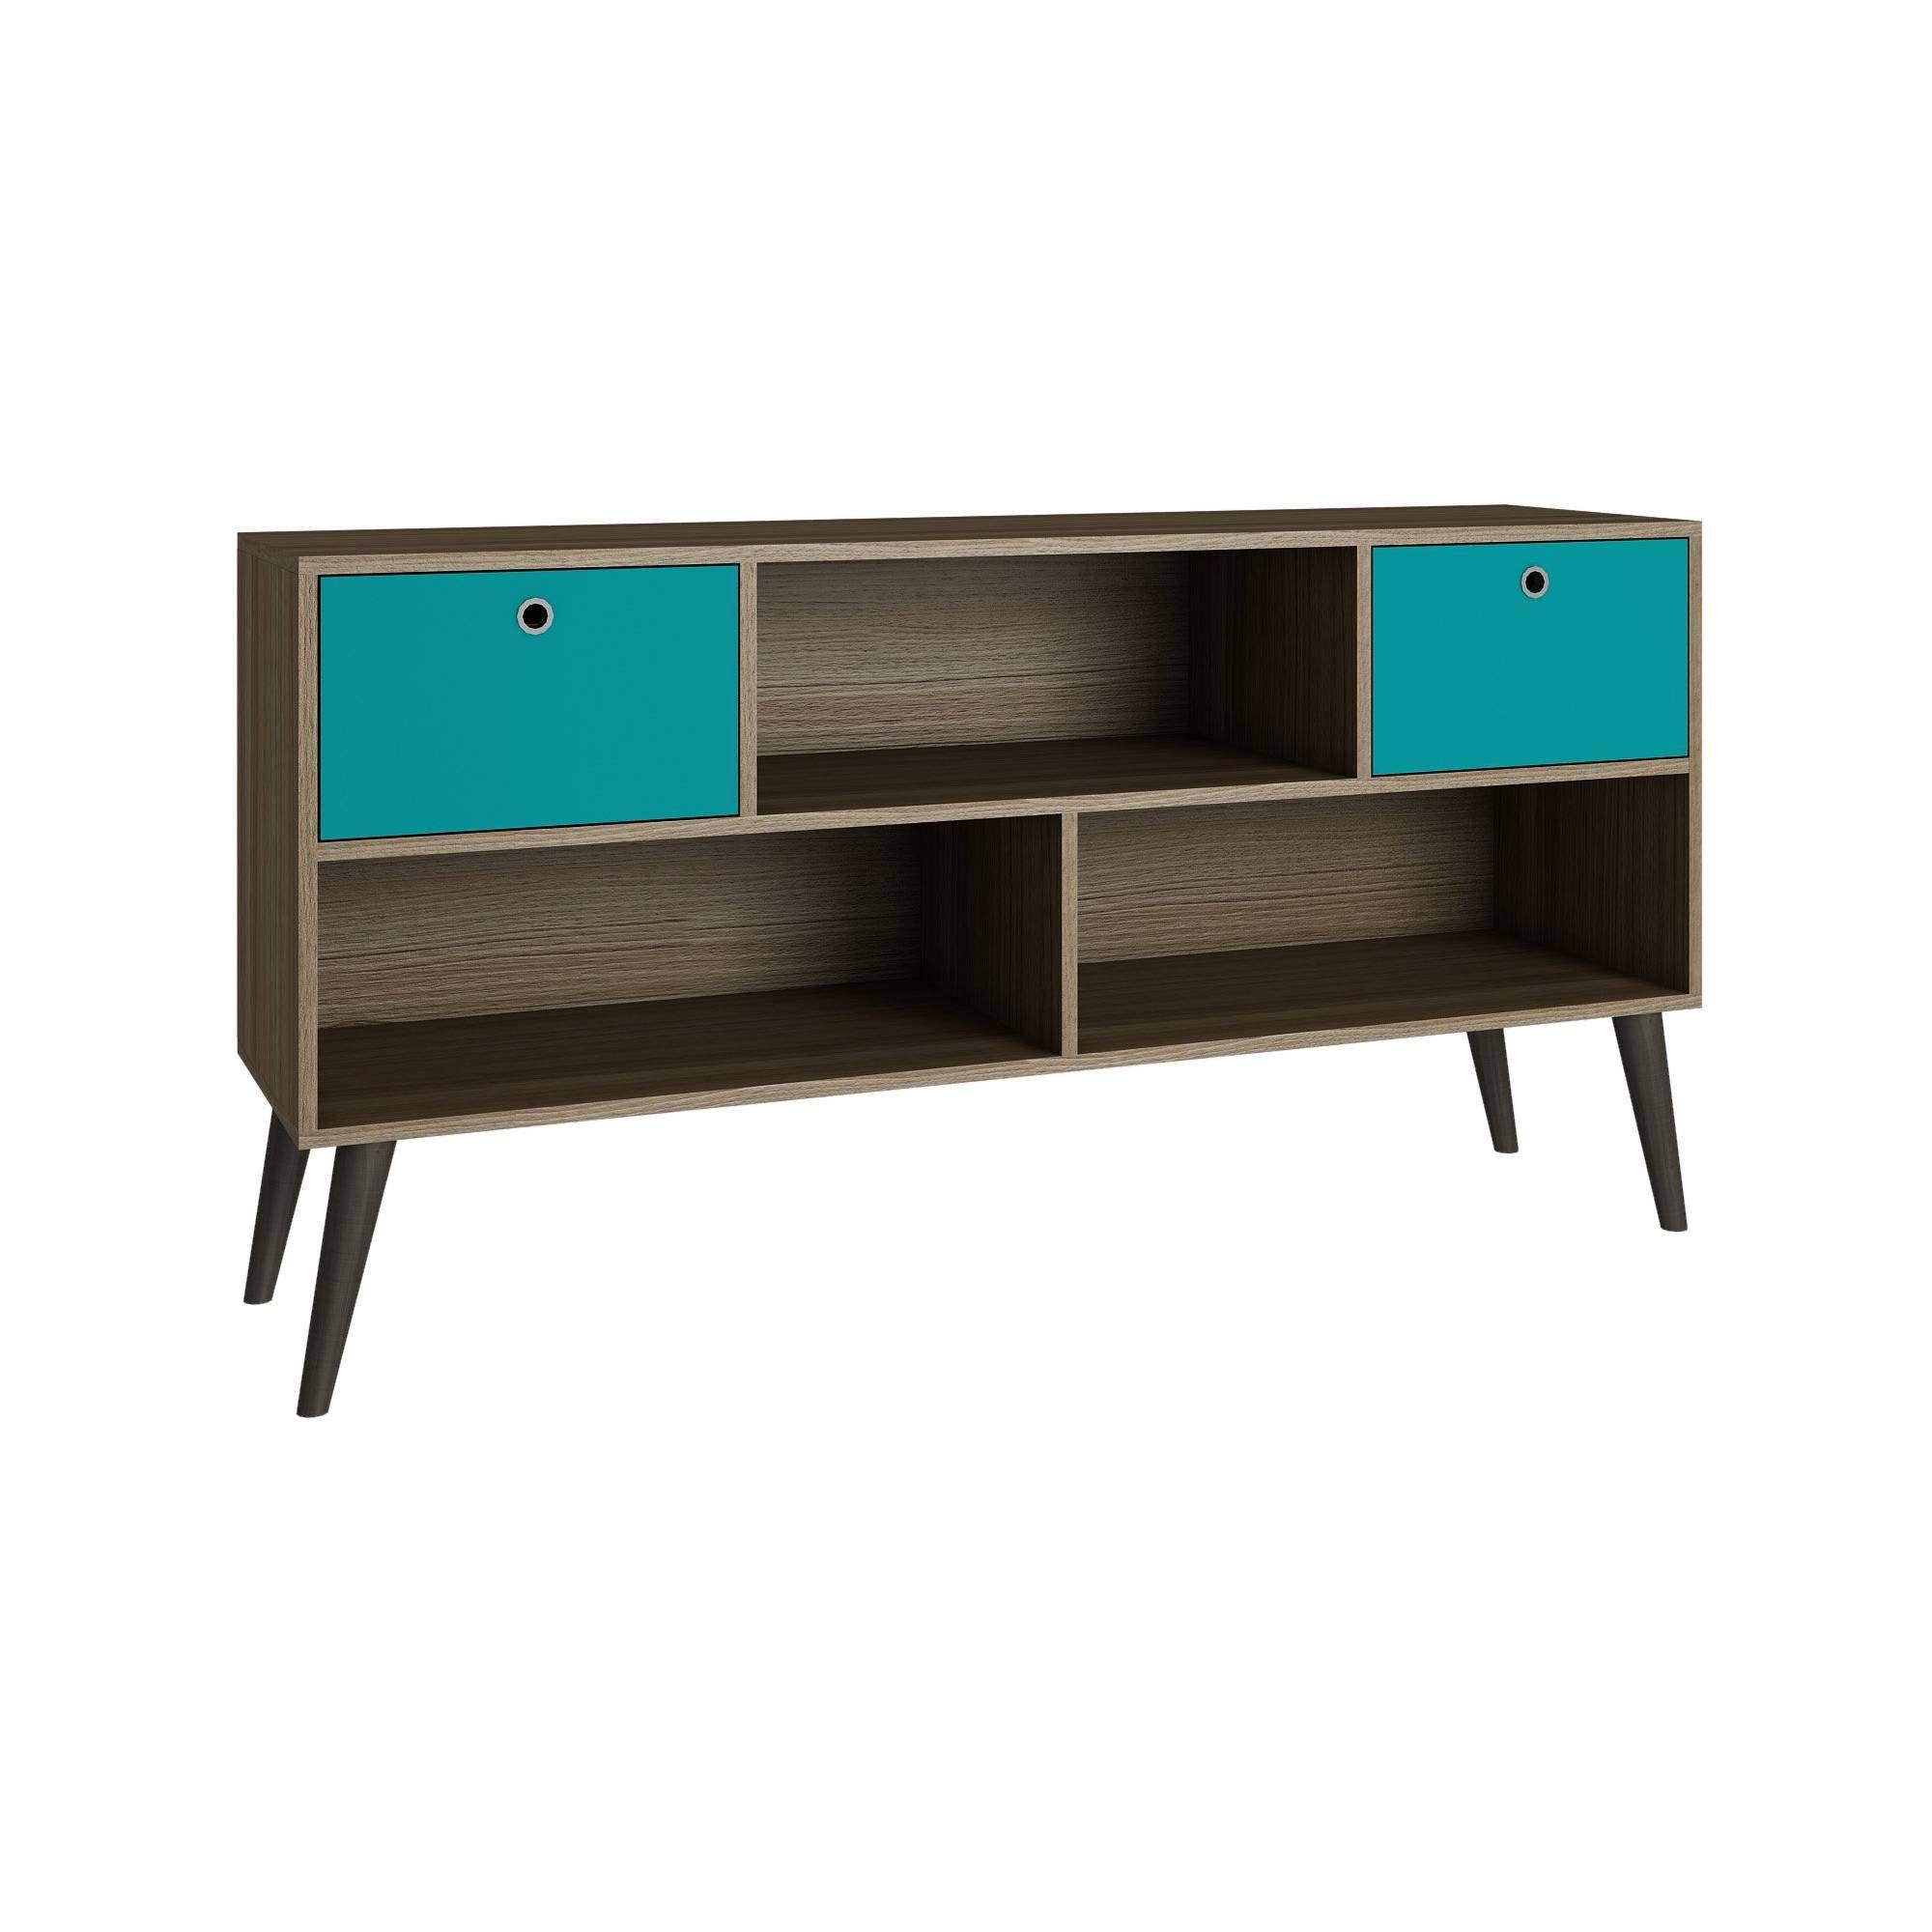 Uppsala Tv Stand With 3 Shelves Oak Brown Aqua Manhattan Comfort